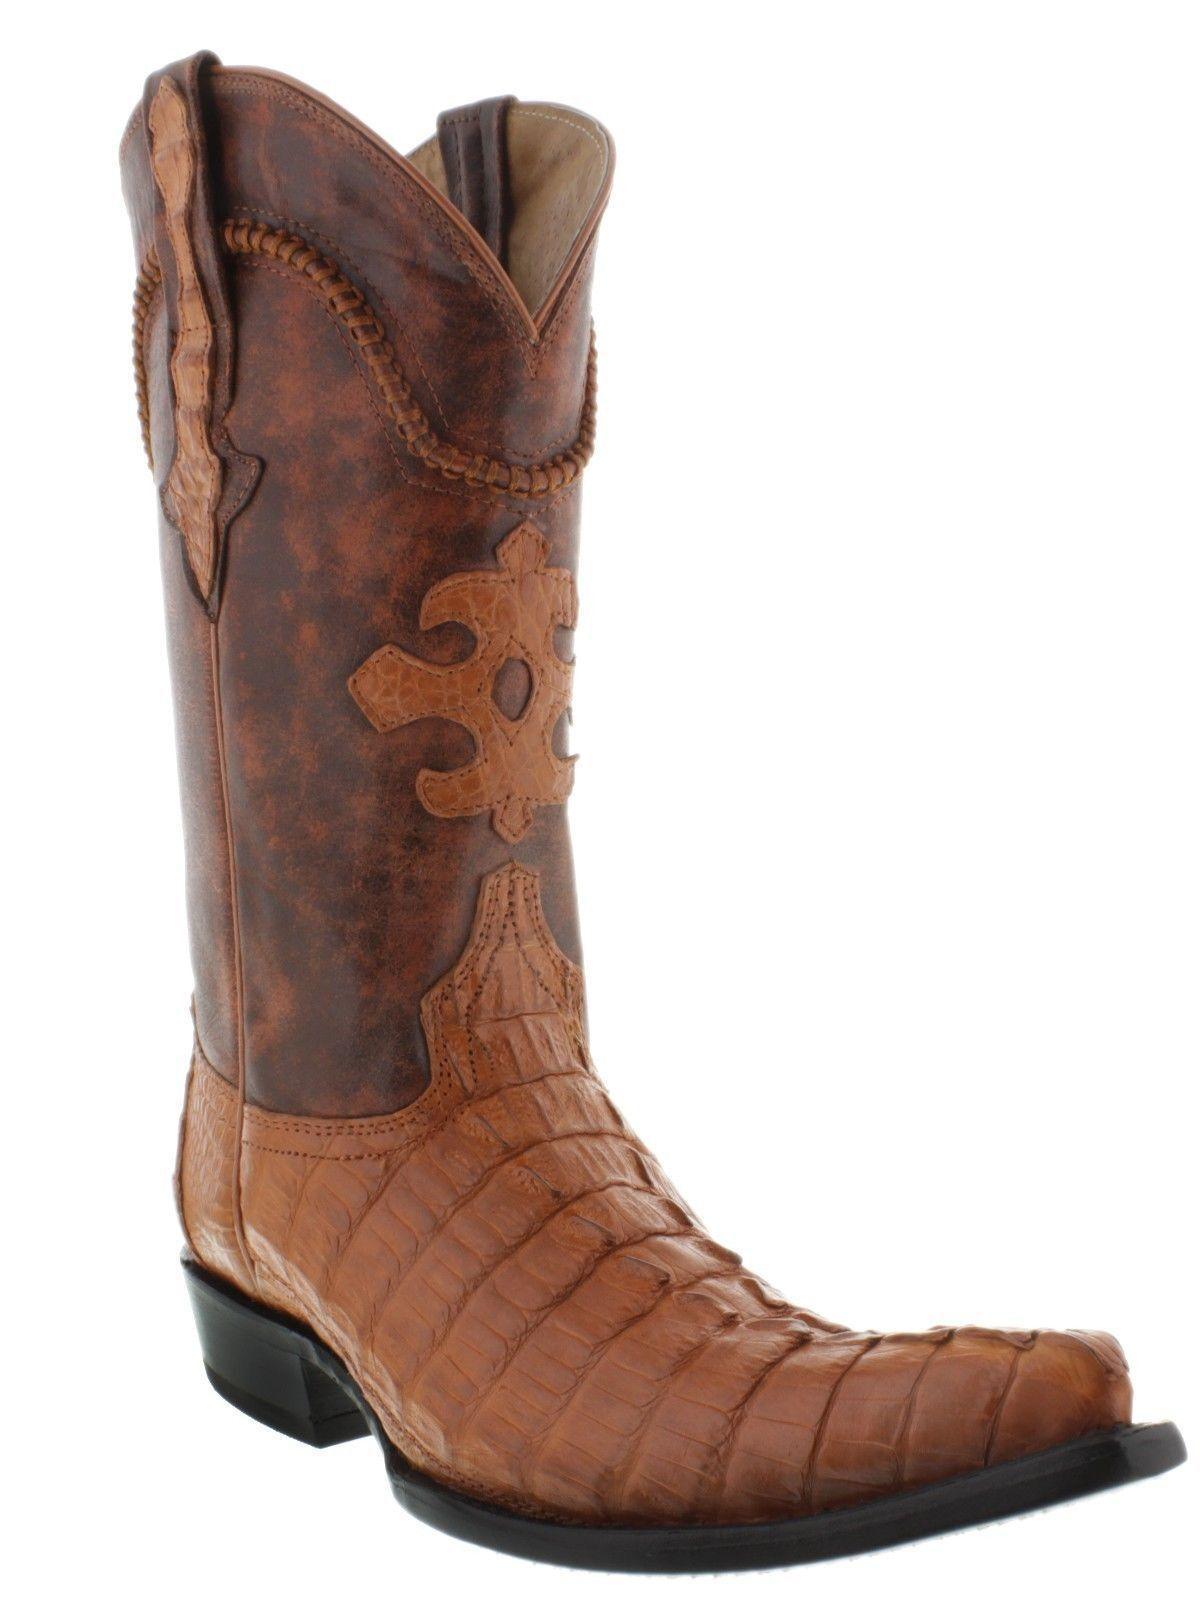 Mens Genuine Cognac Alligator Crocodile Leather Western Cowboy Boots 3X Toe